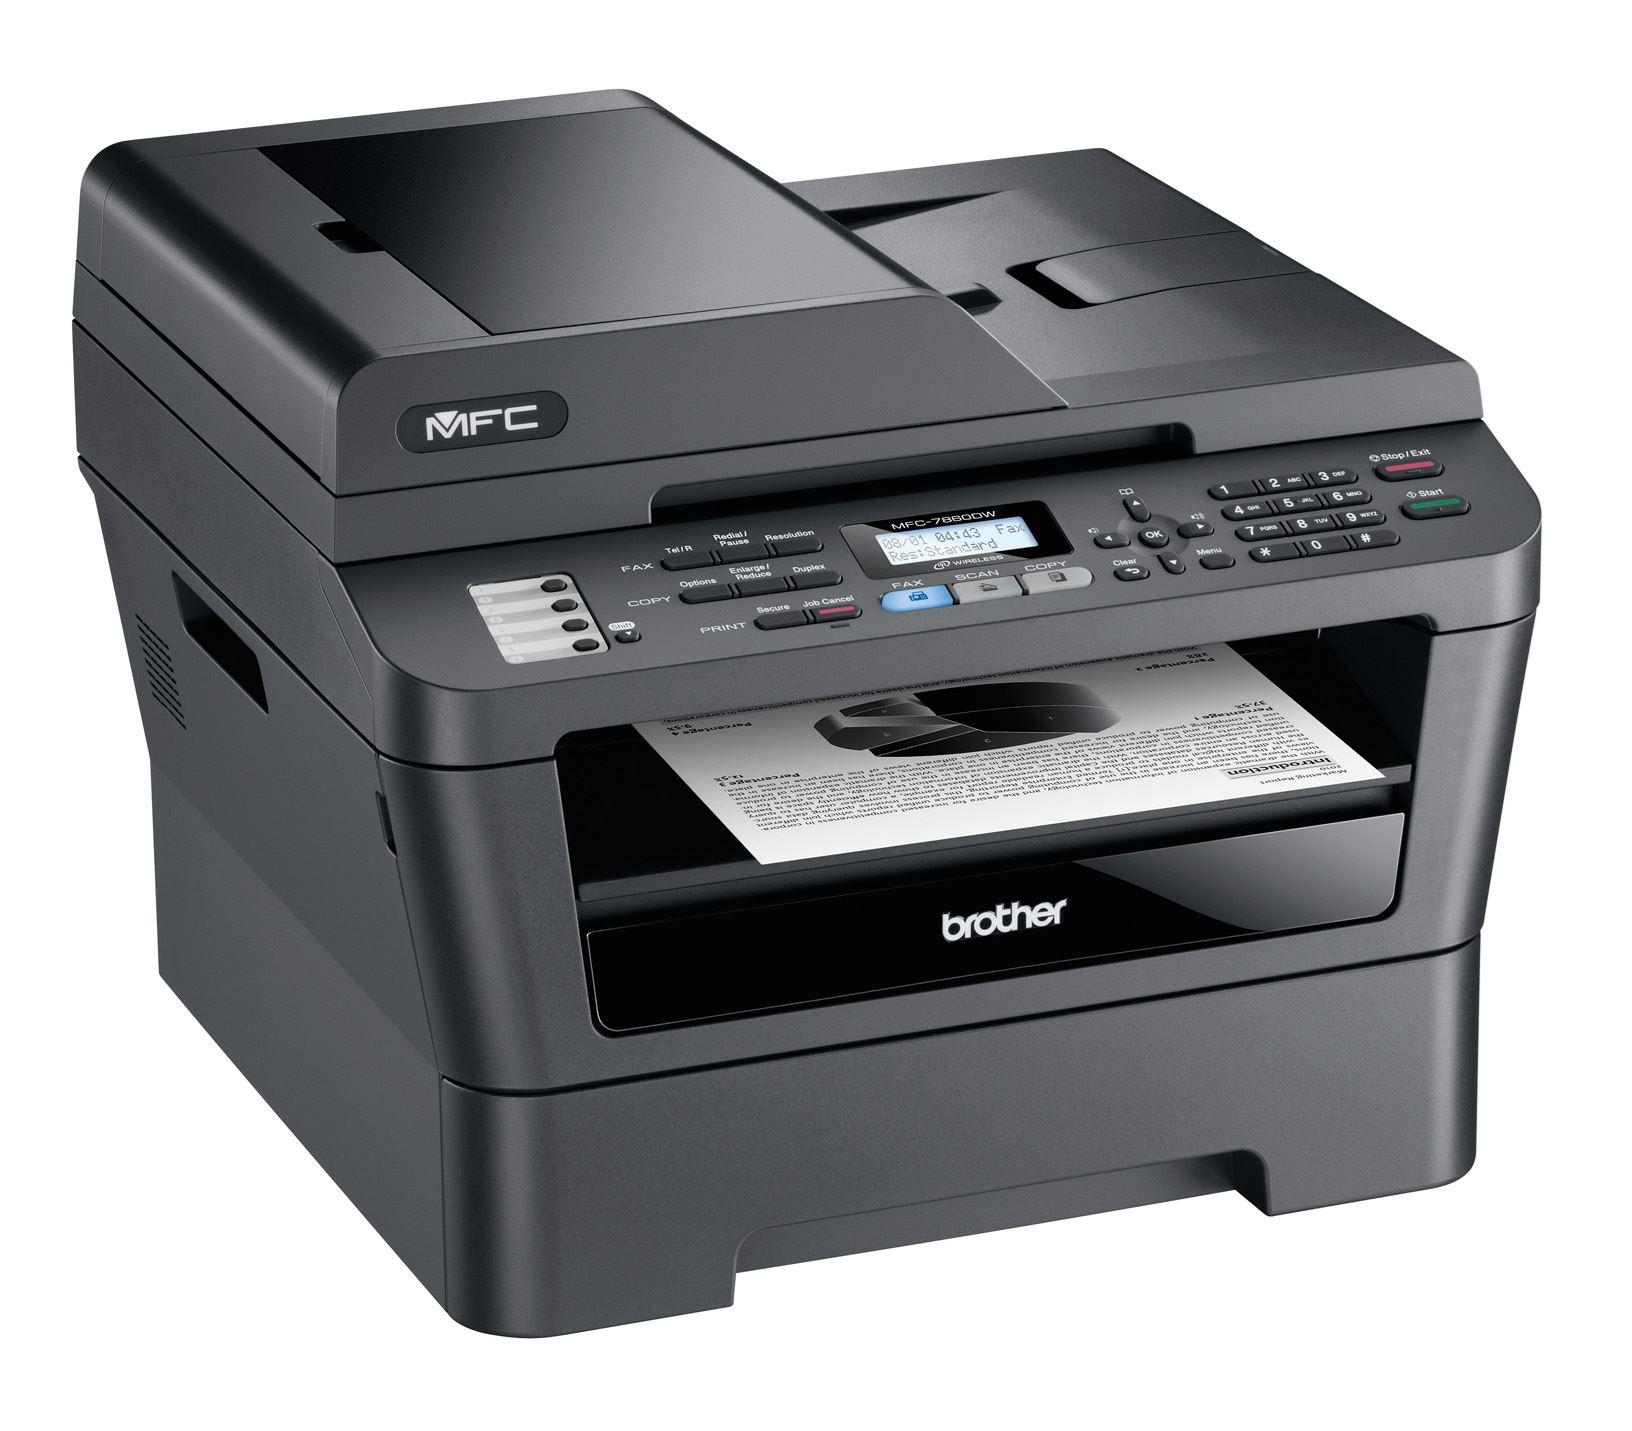 Принтер Brother MFC-7860DW